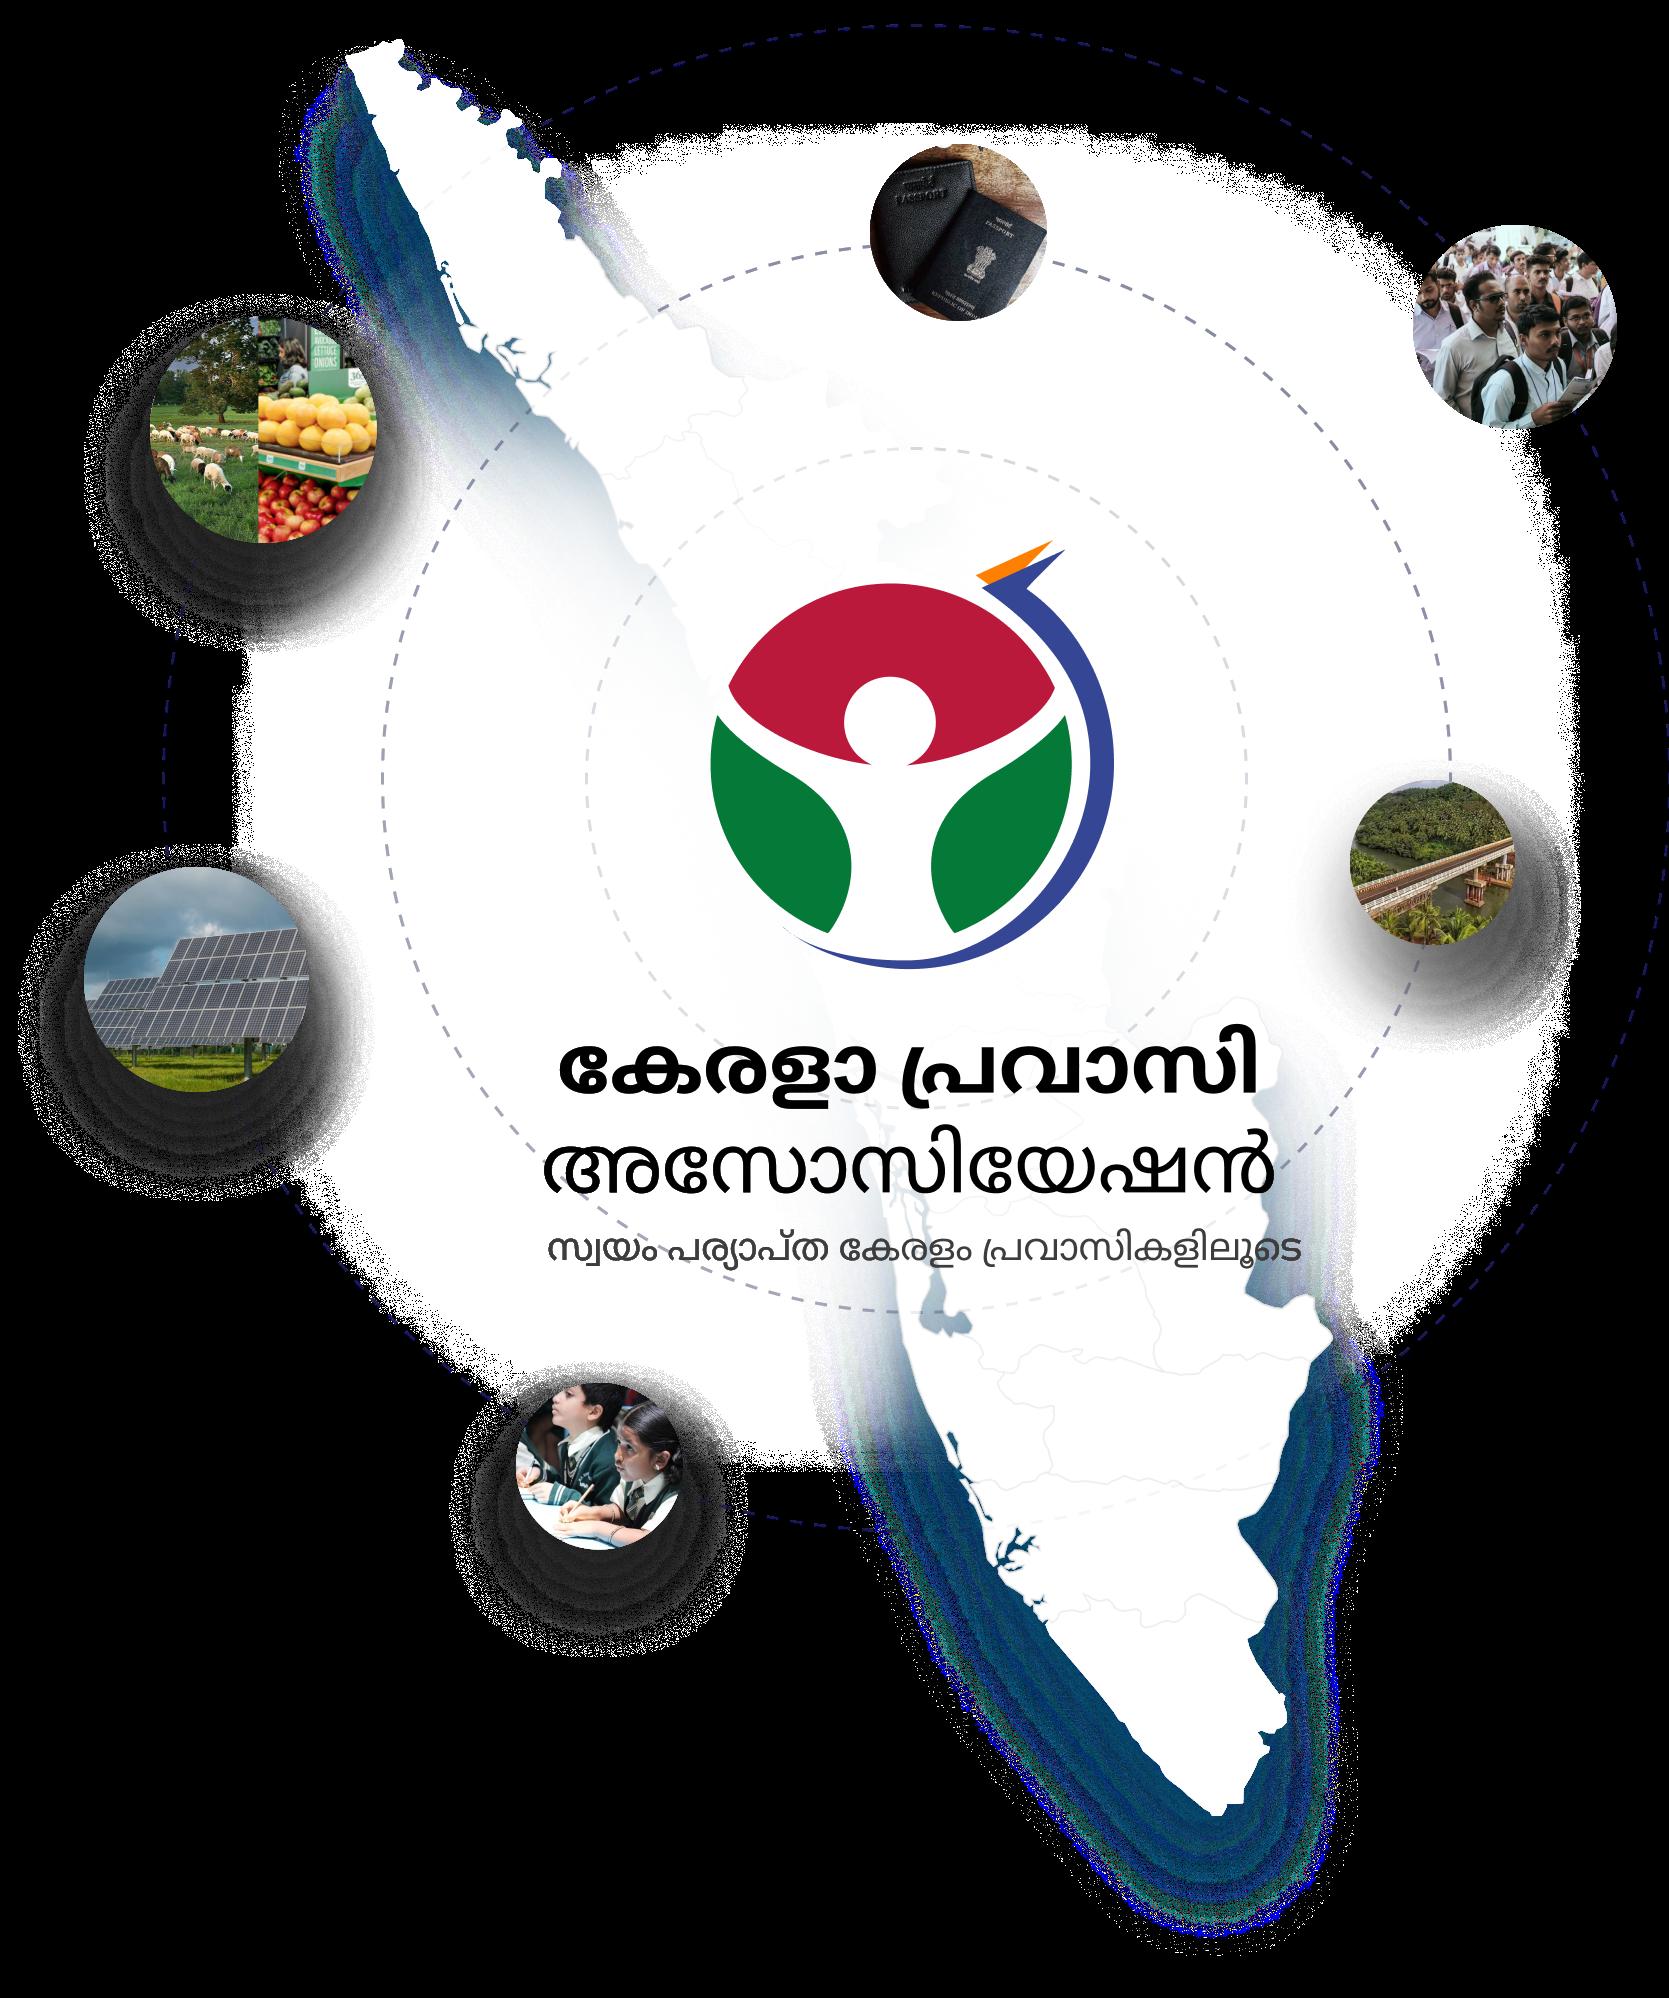 About Kerala Pravasi Association